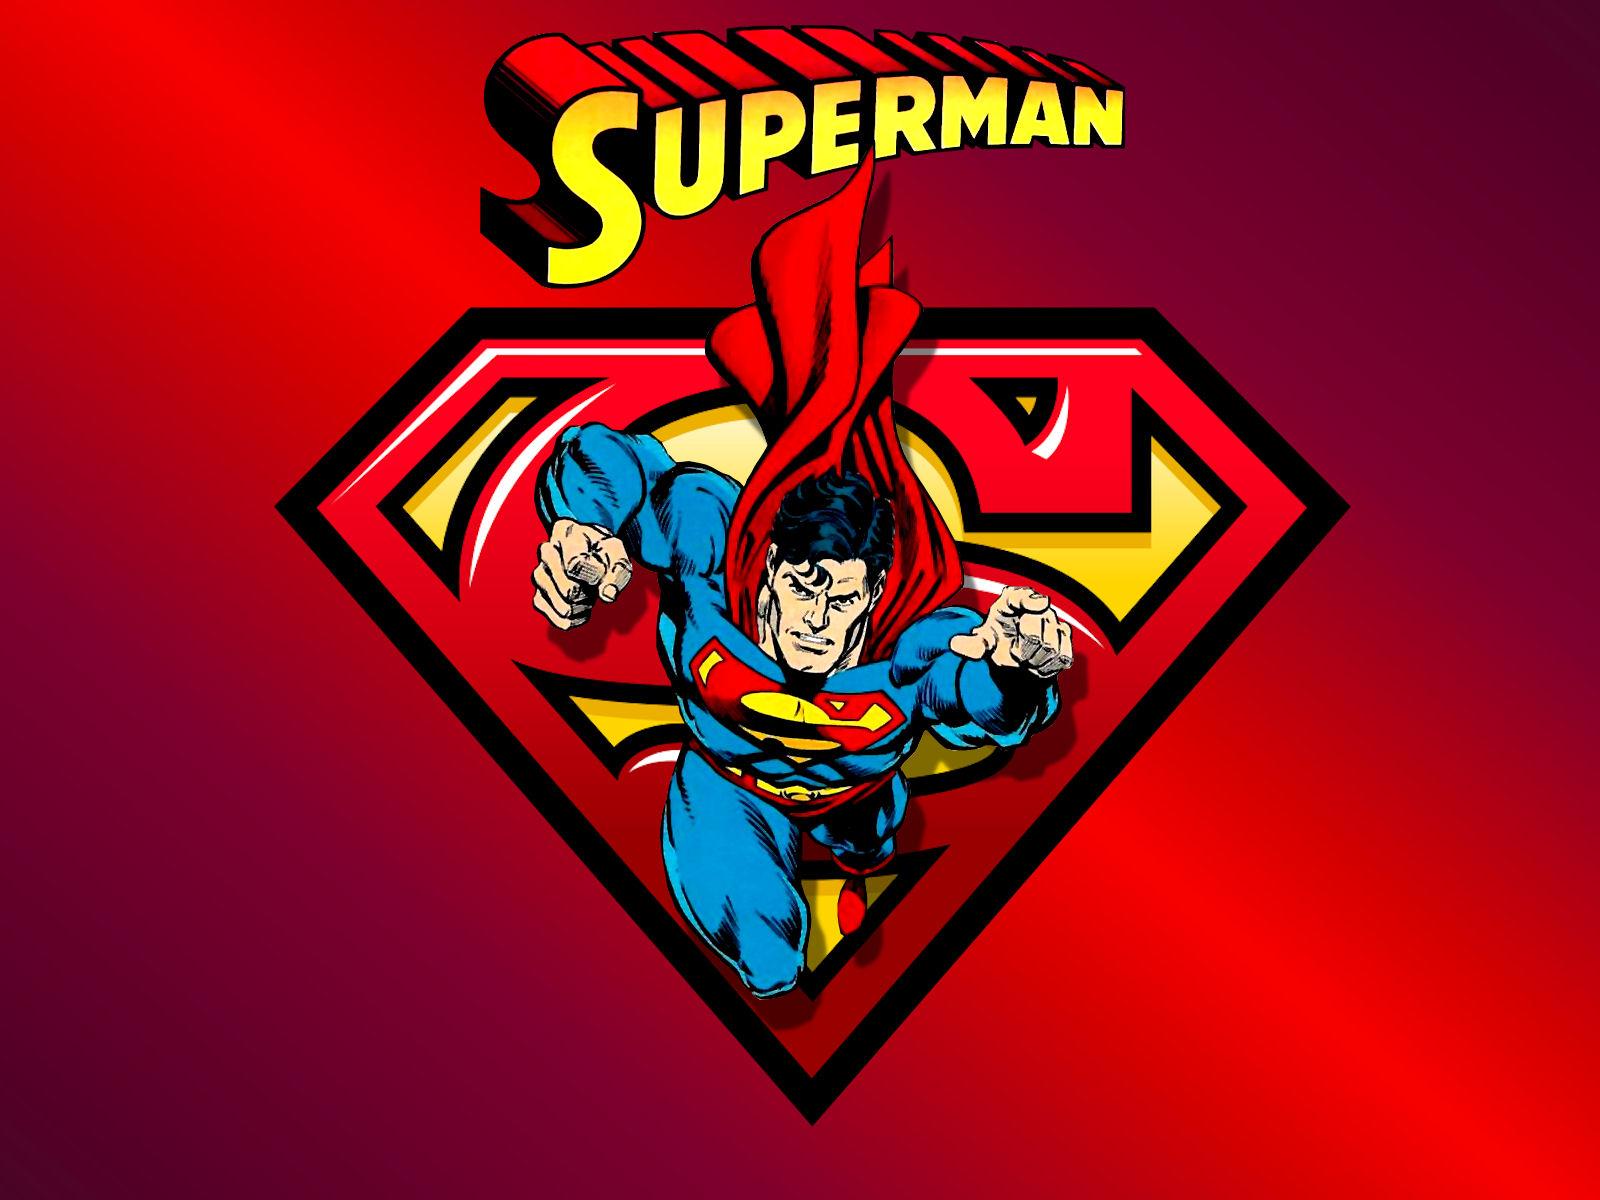 Superman Wallpaper 1 by Superman8193 1600x1200